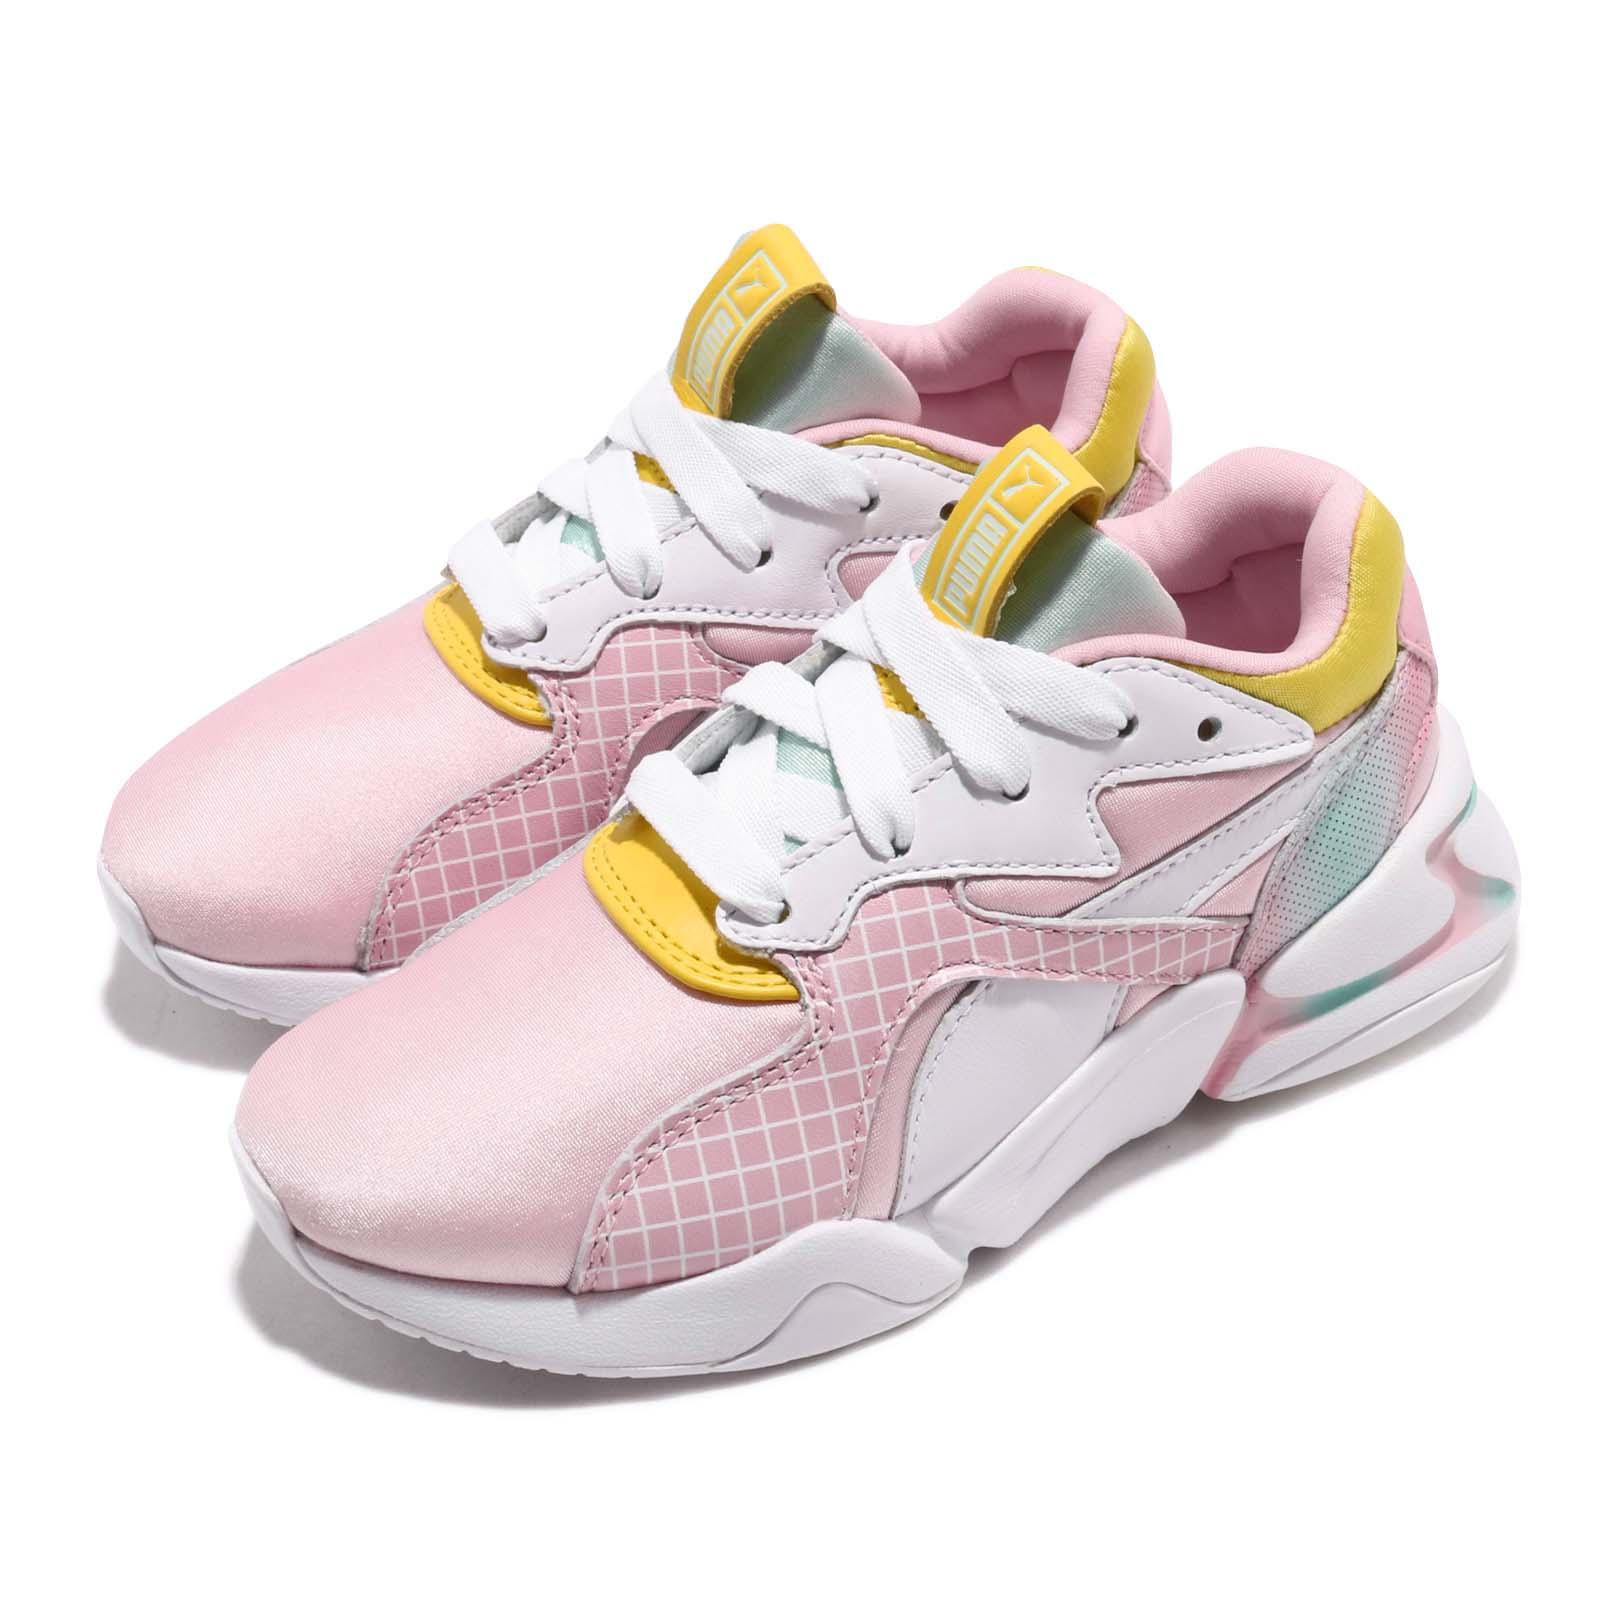 Puma 休閒鞋 Nova x Barbie FL 童鞋 37073101